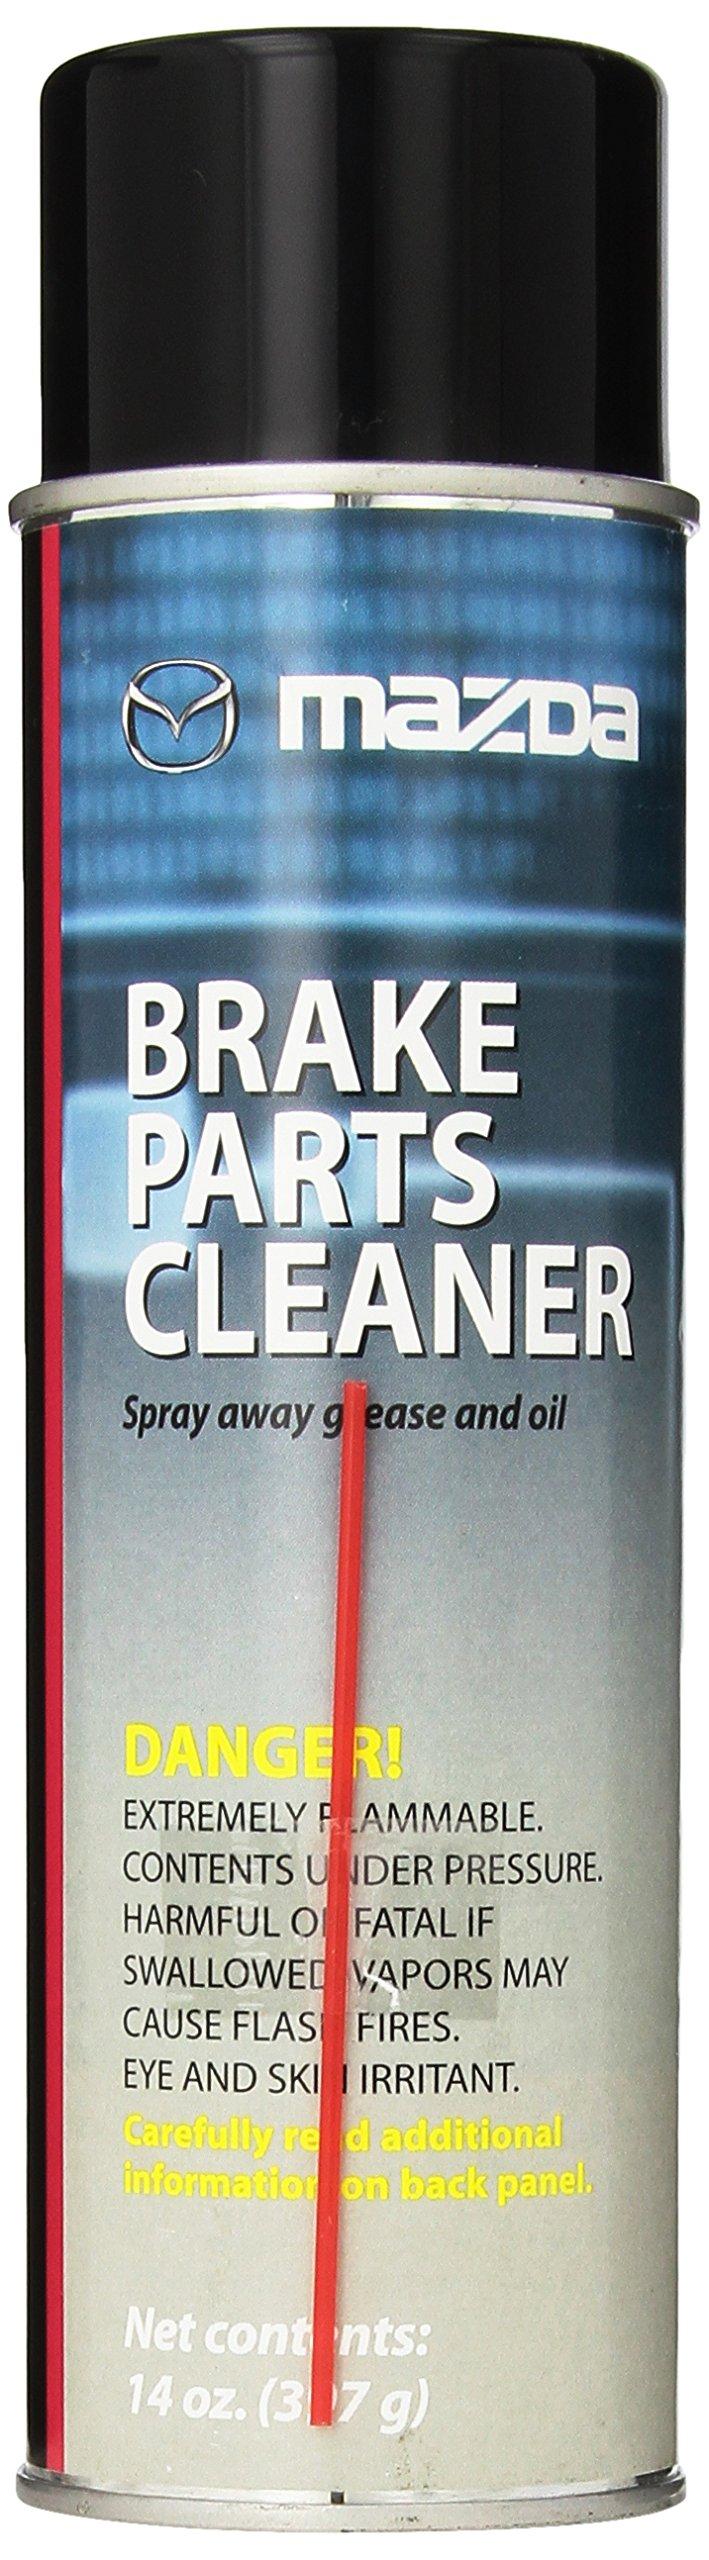 Mazda Genuine Fluid (0000-77-620E-03) Low VOC Non-Chlorinated Brake Parts Cleaner - 14 oz.